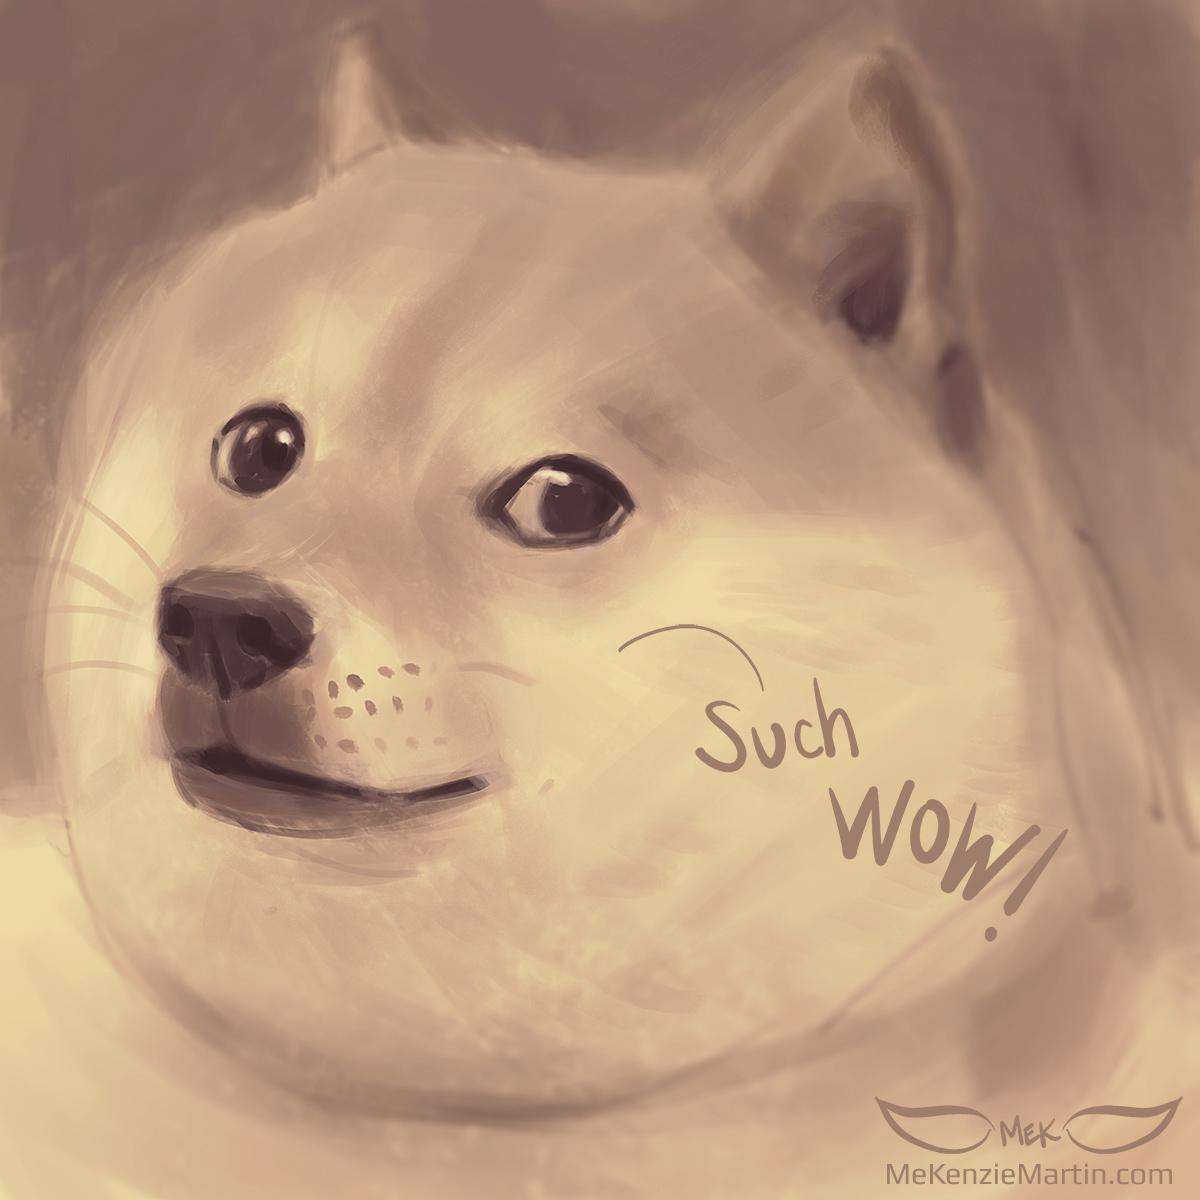 Doge wow intensifies